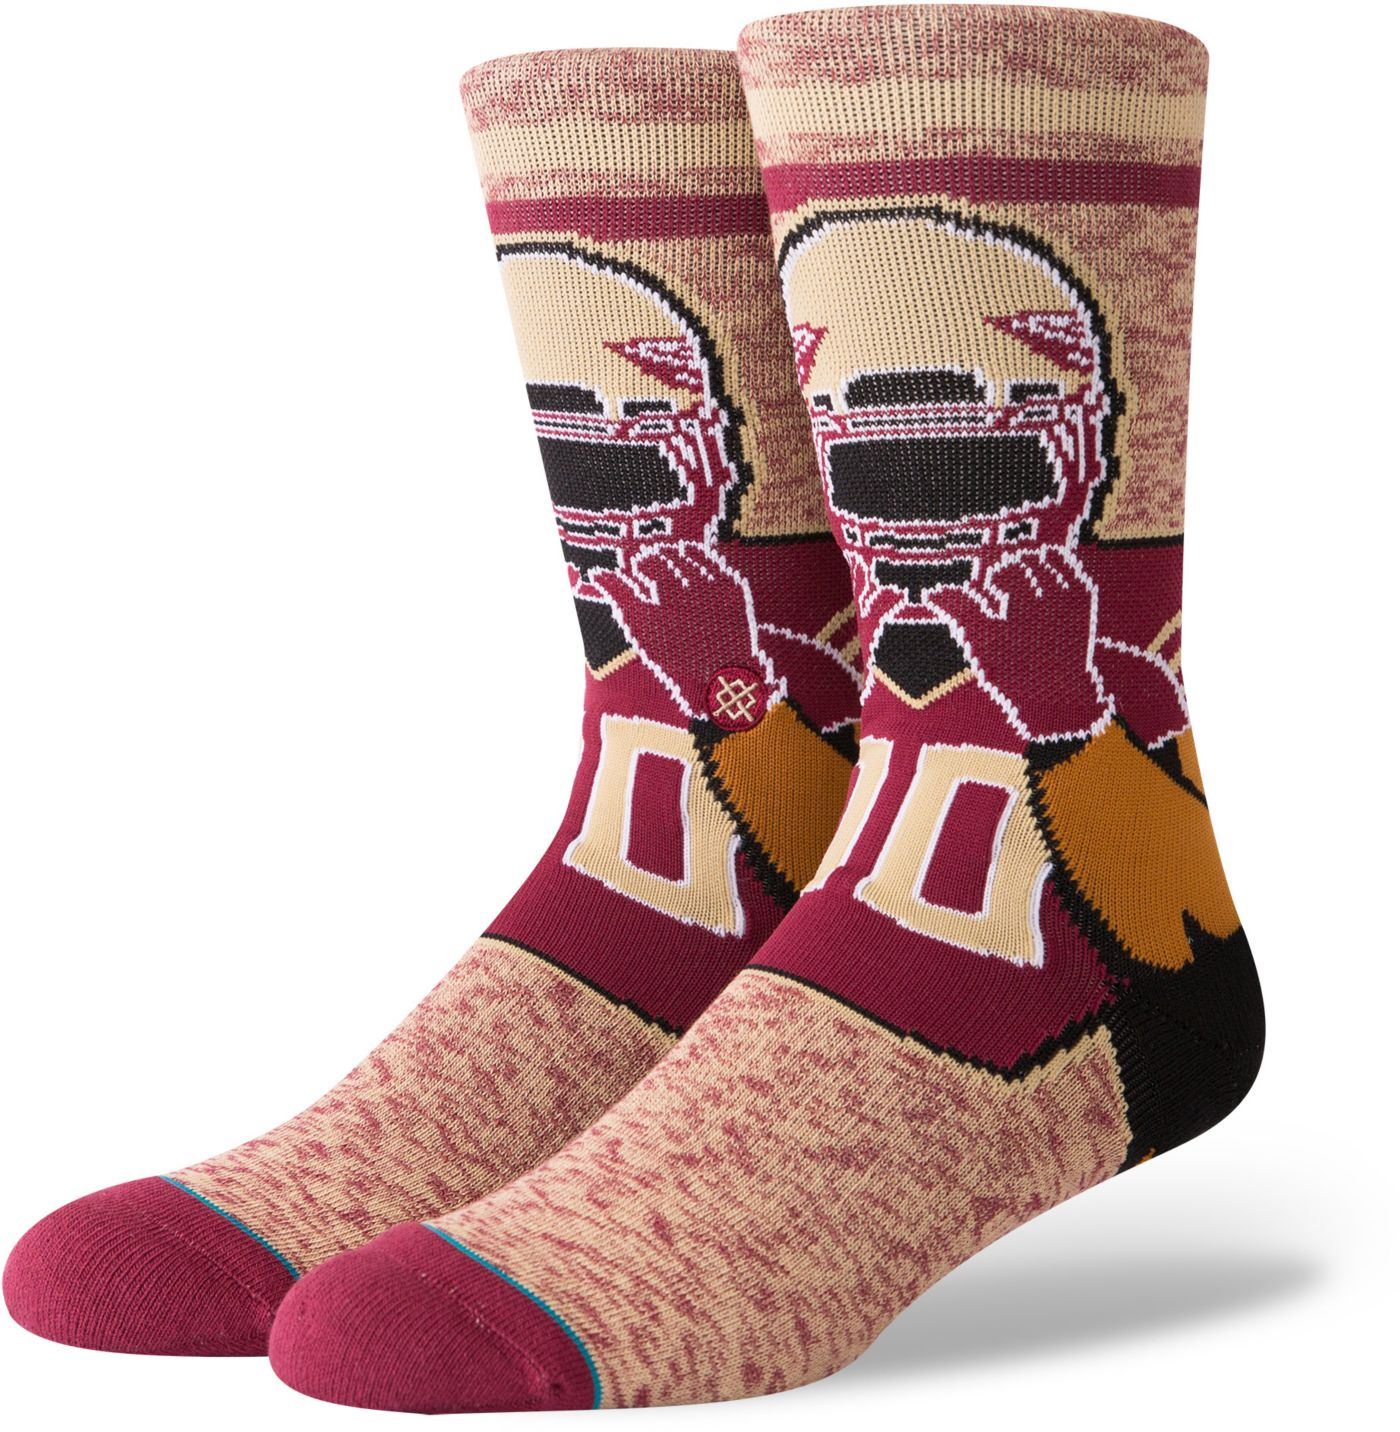 Stance Men's Florida State Seminoles Character Crew Socks